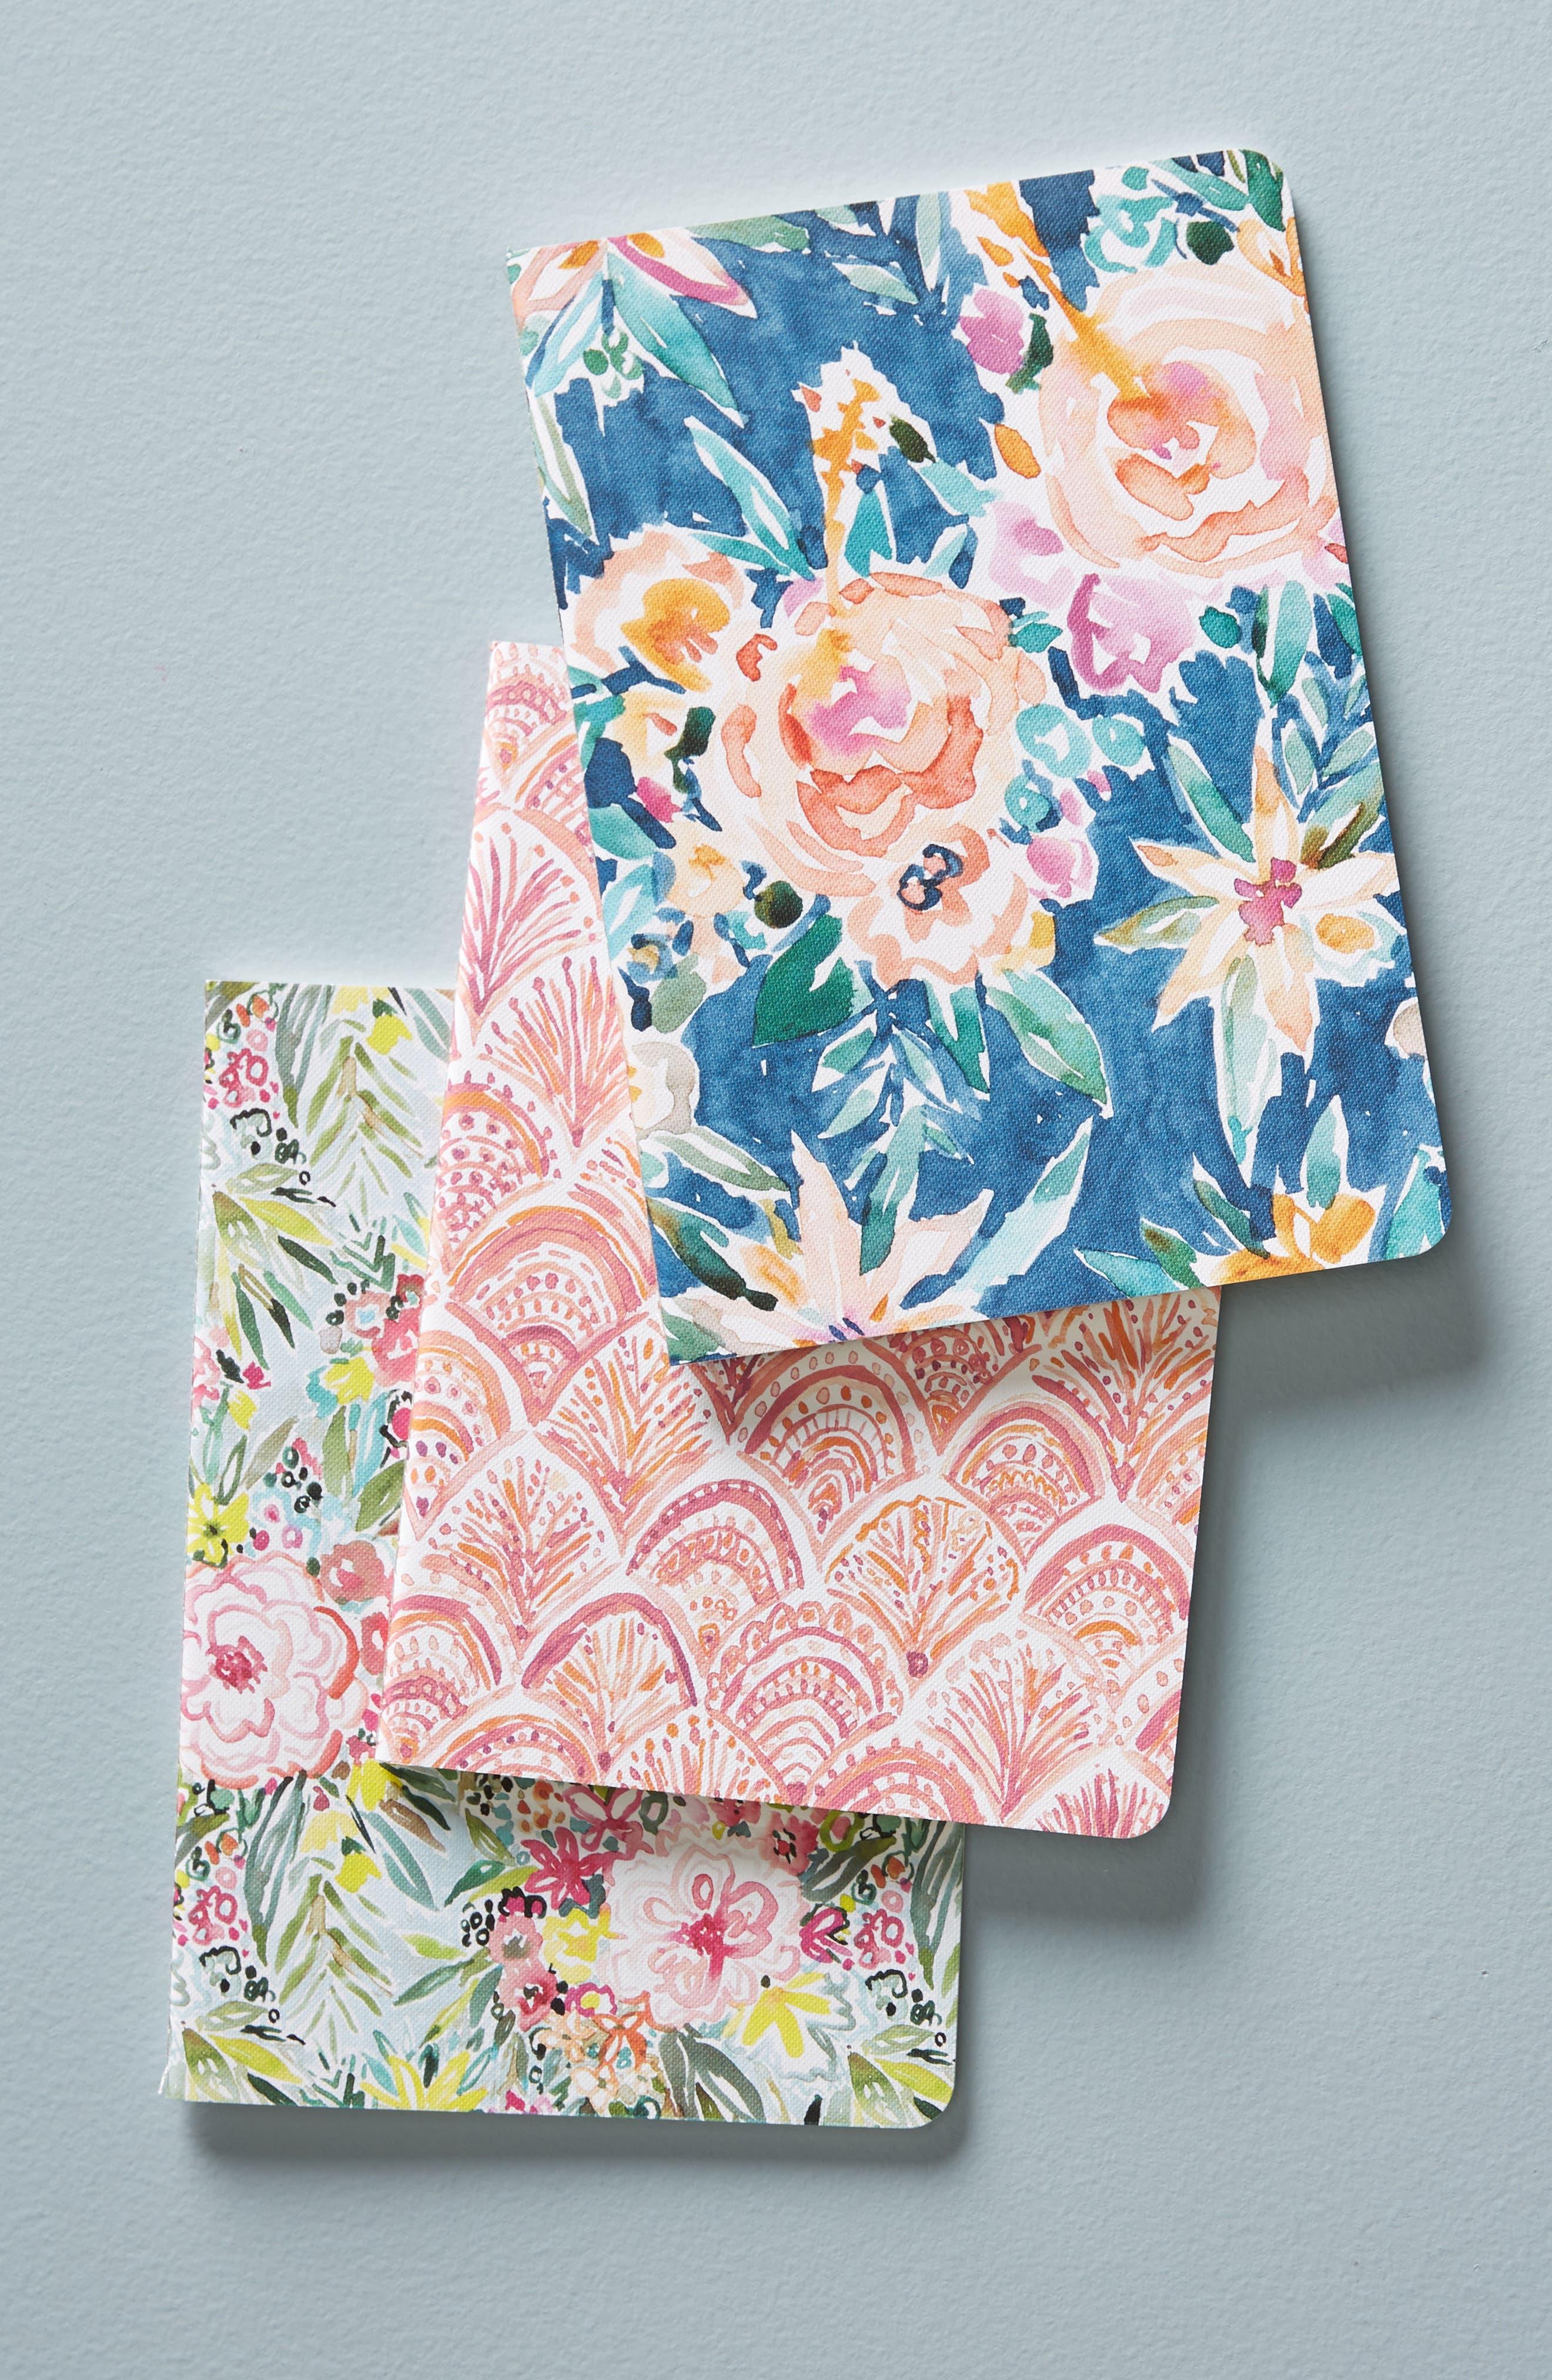 Wild At Heart Set of 3 Journals,                             Main thumbnail 1, color,                             400